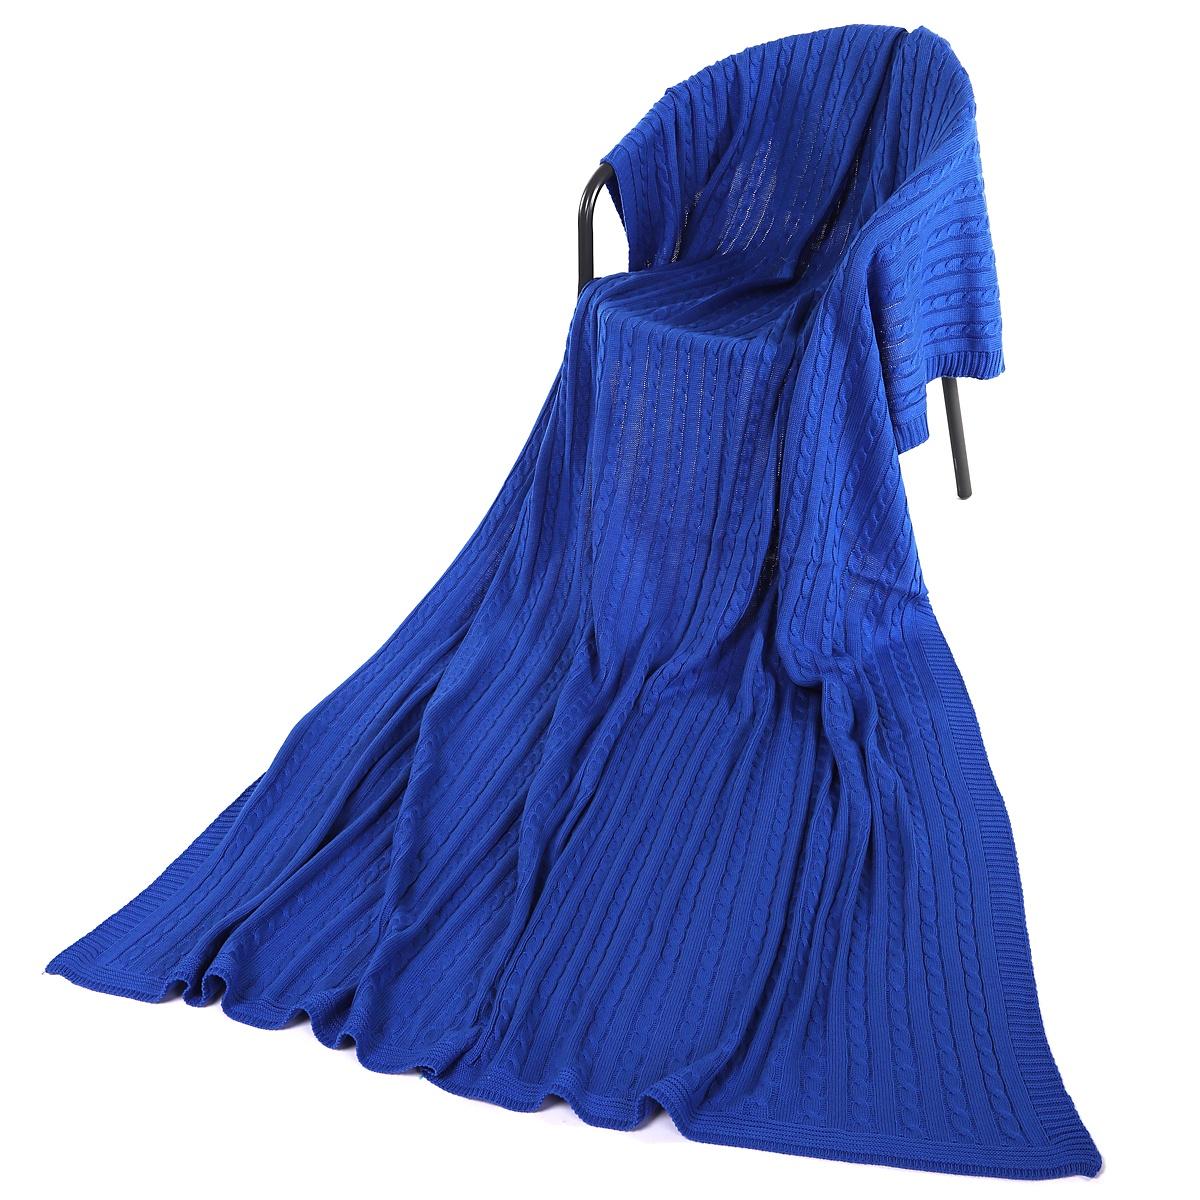 Плед ANRI АНРИ-П-3160х220079-160х220, синий